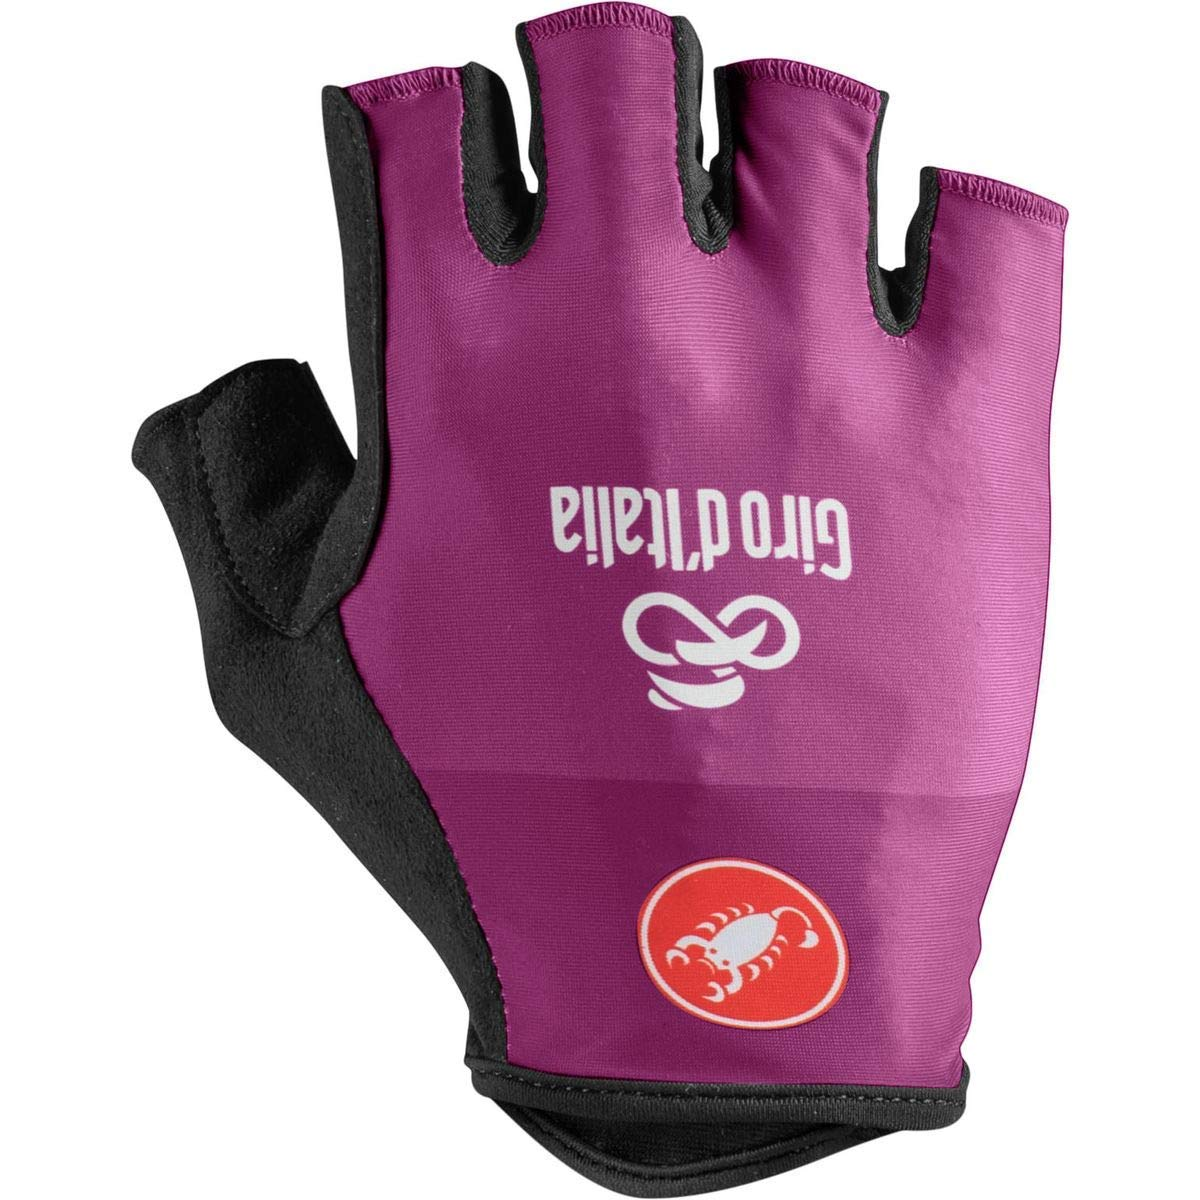 Castelli 9510209 # Giro102 Glove Mens Cycling Gloves